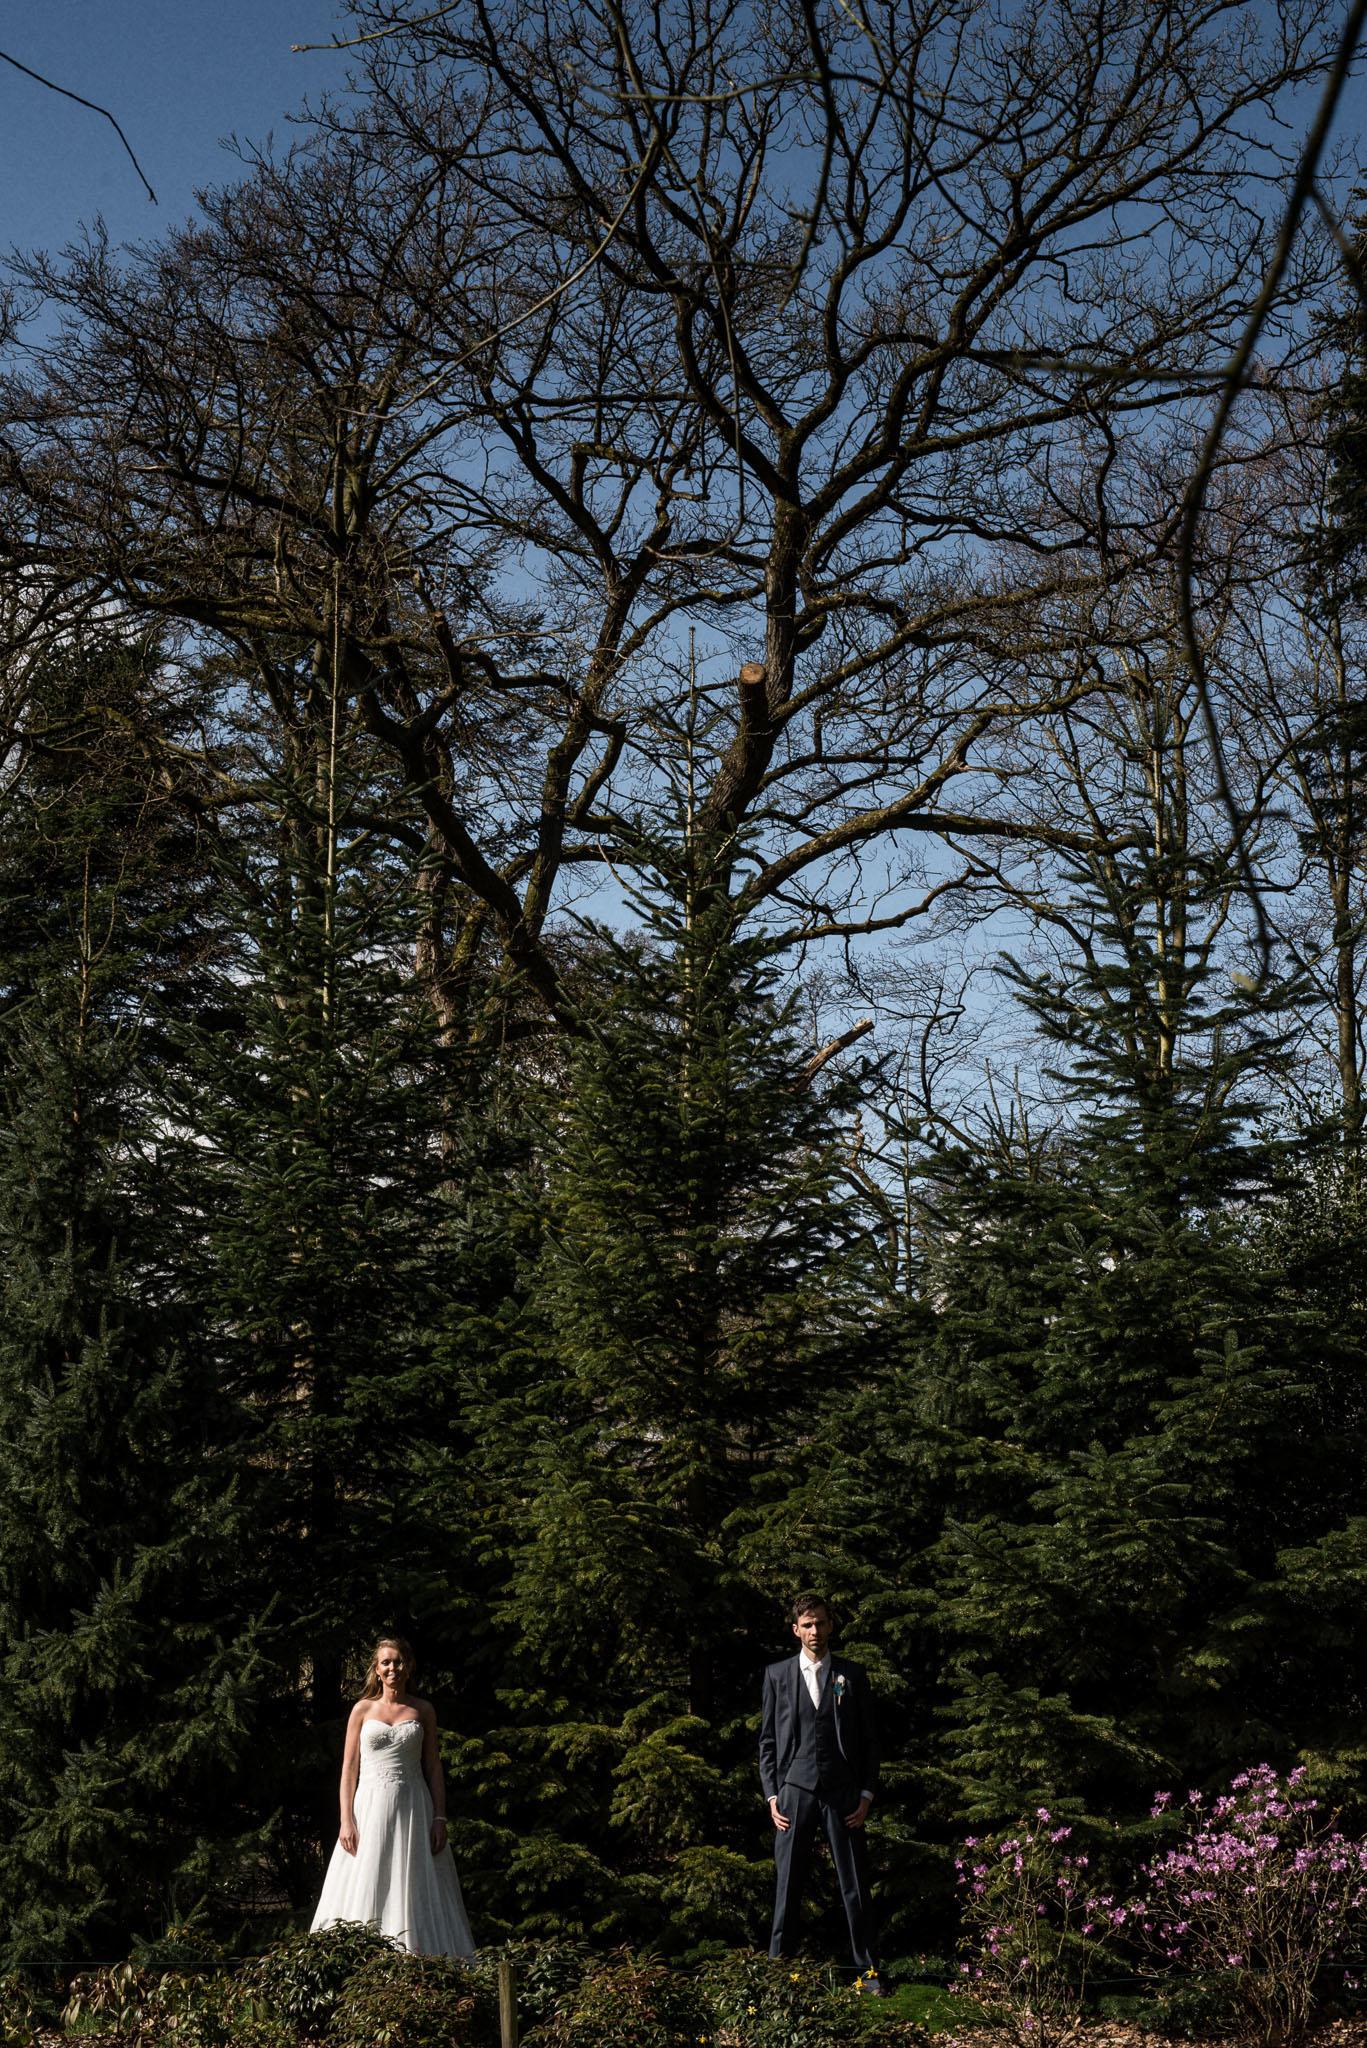 19 van 51 - trouwfotografie-gelske-reinier-friesland - 0076